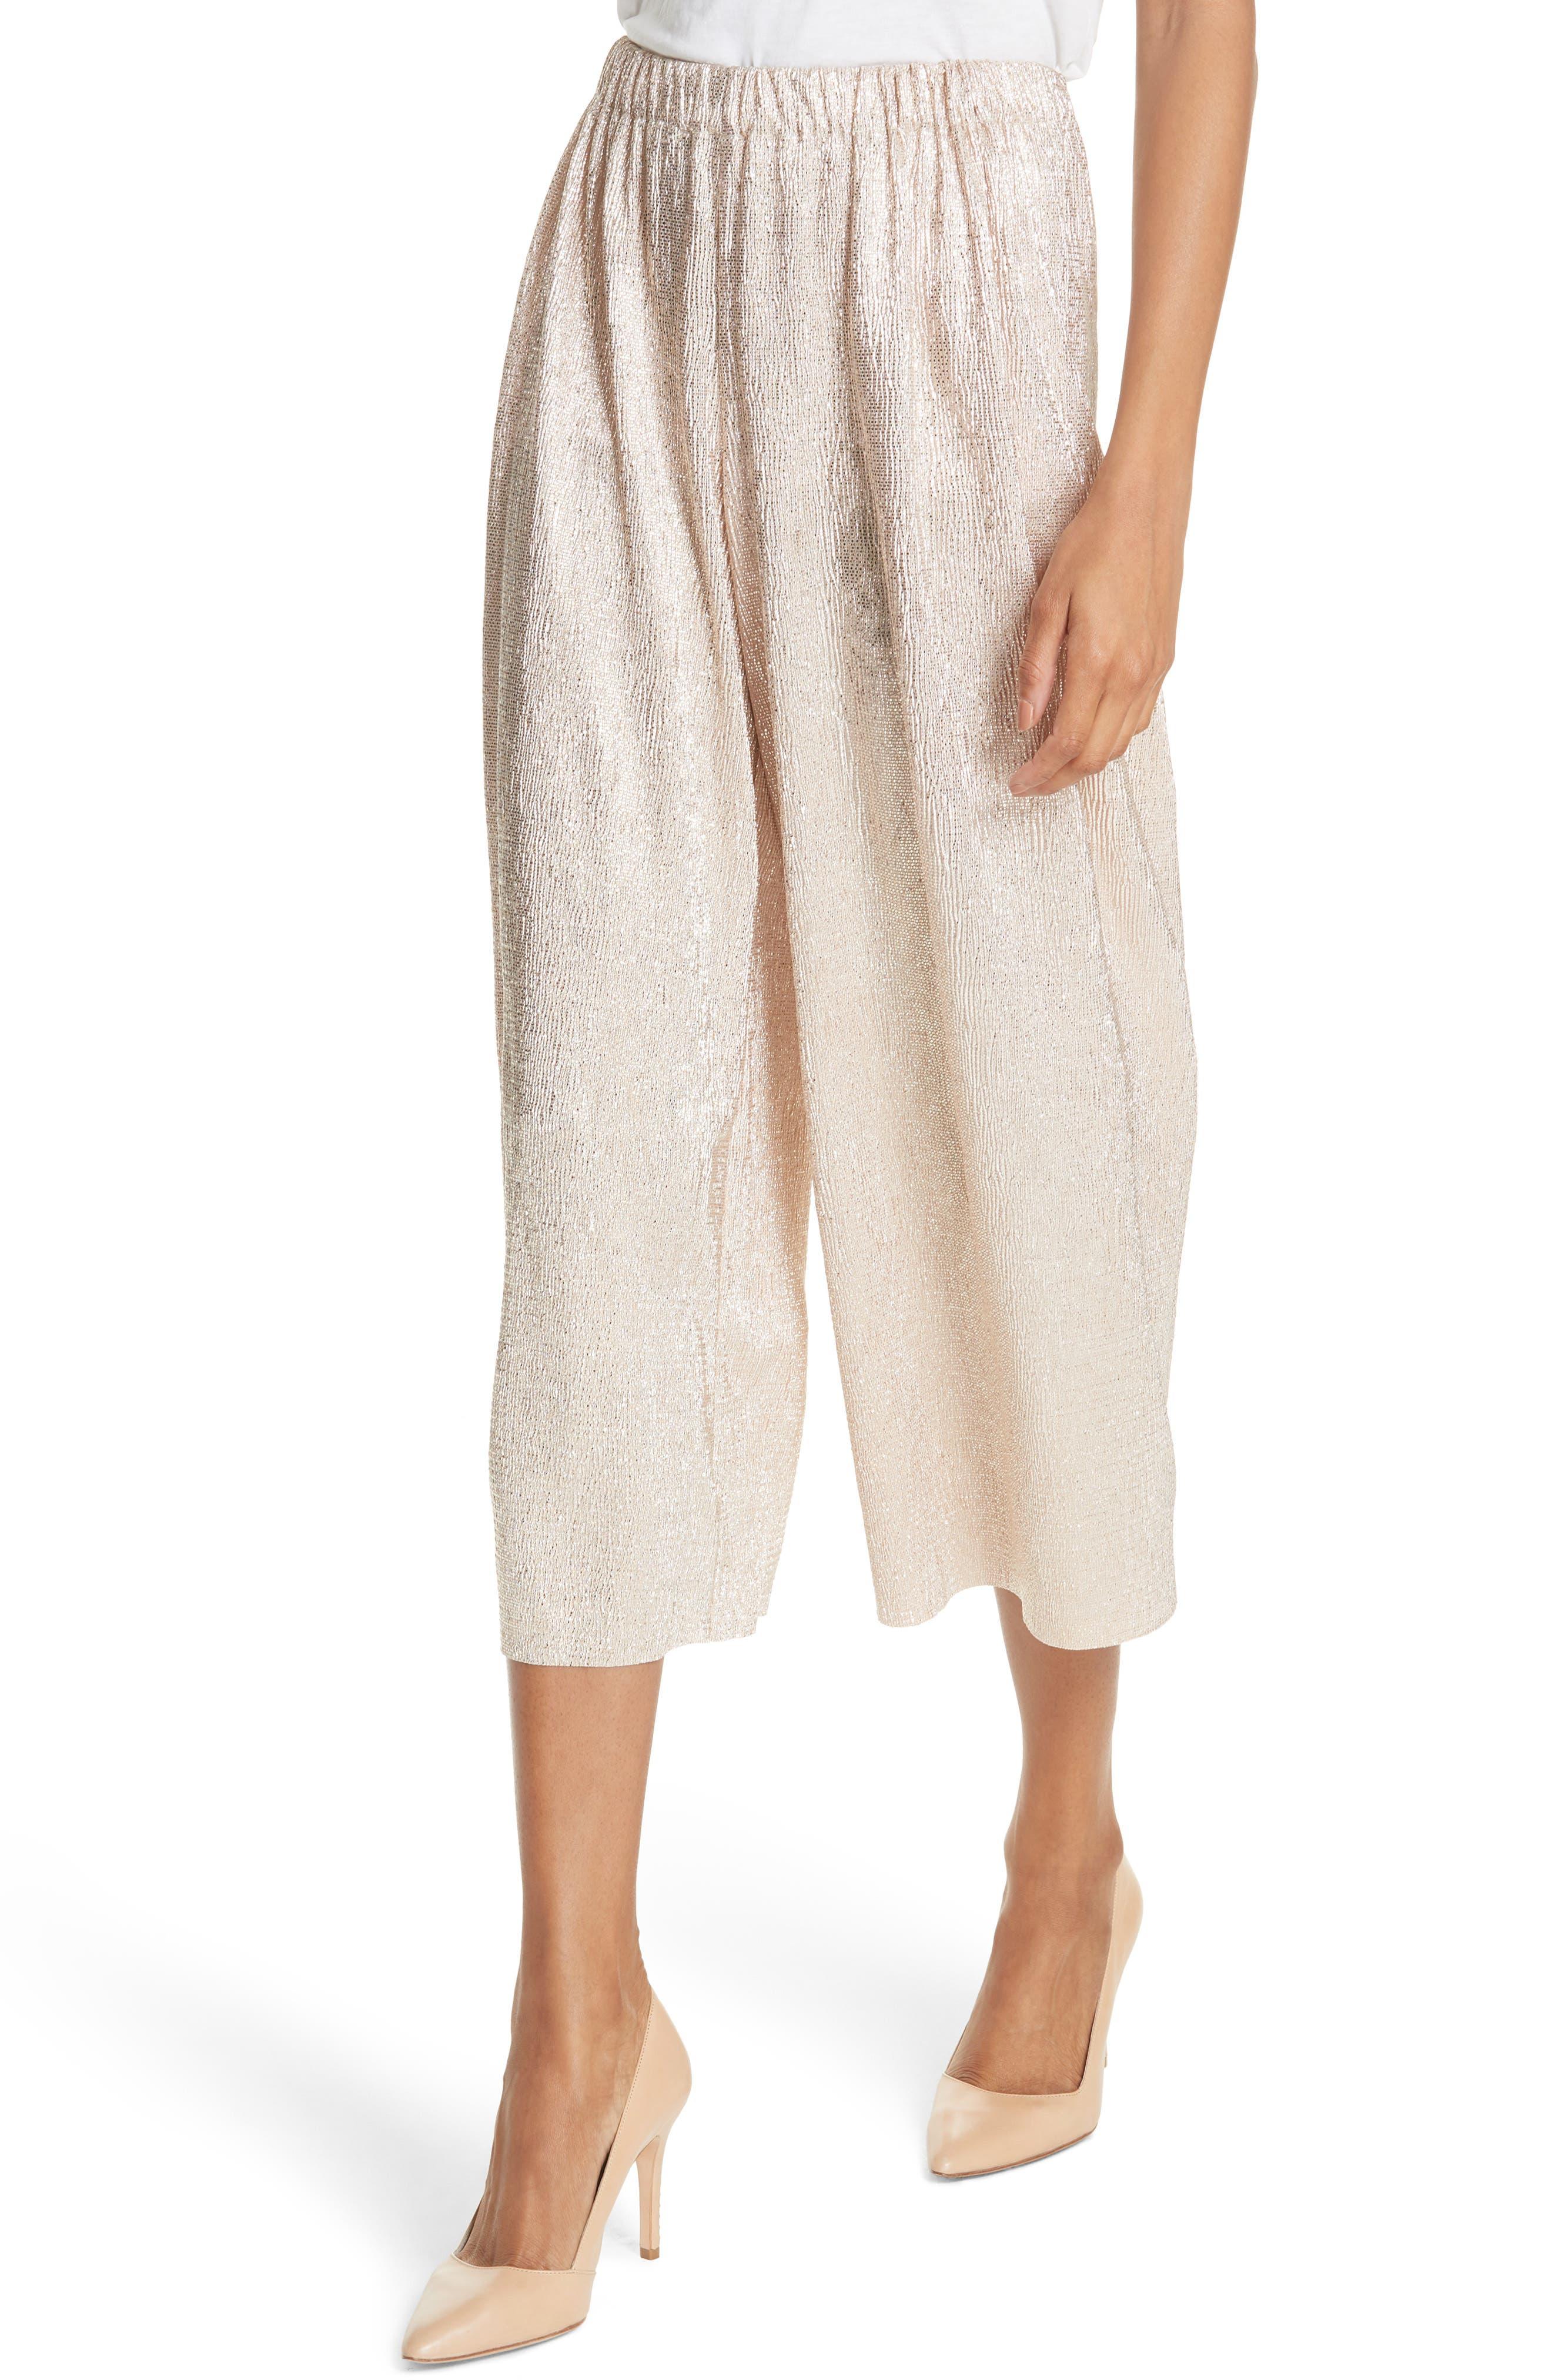 Elba Textured Crepe Wide Leg Pants,                             Alternate thumbnail 4, color,                             Blush